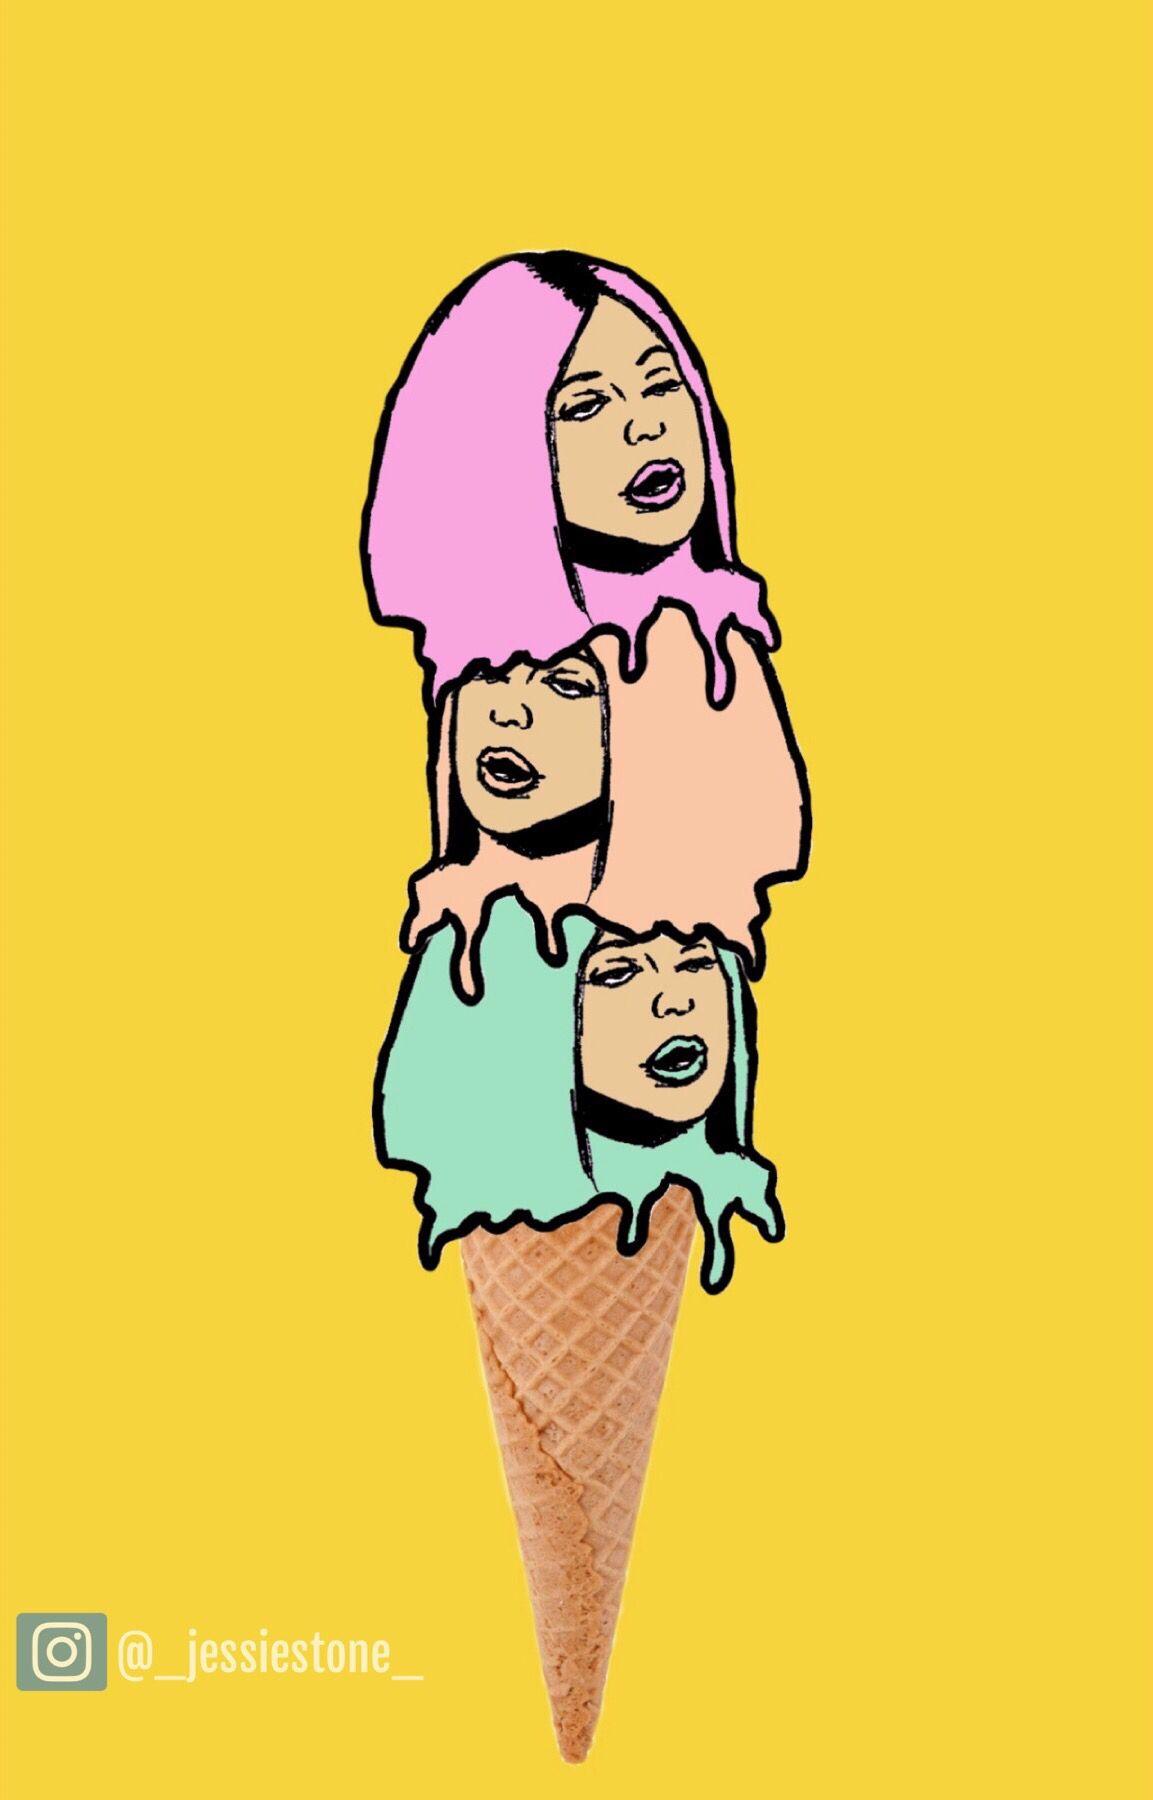 Kylie Jenner Fan Art Kylie Jenner Pop Art Graphic Design